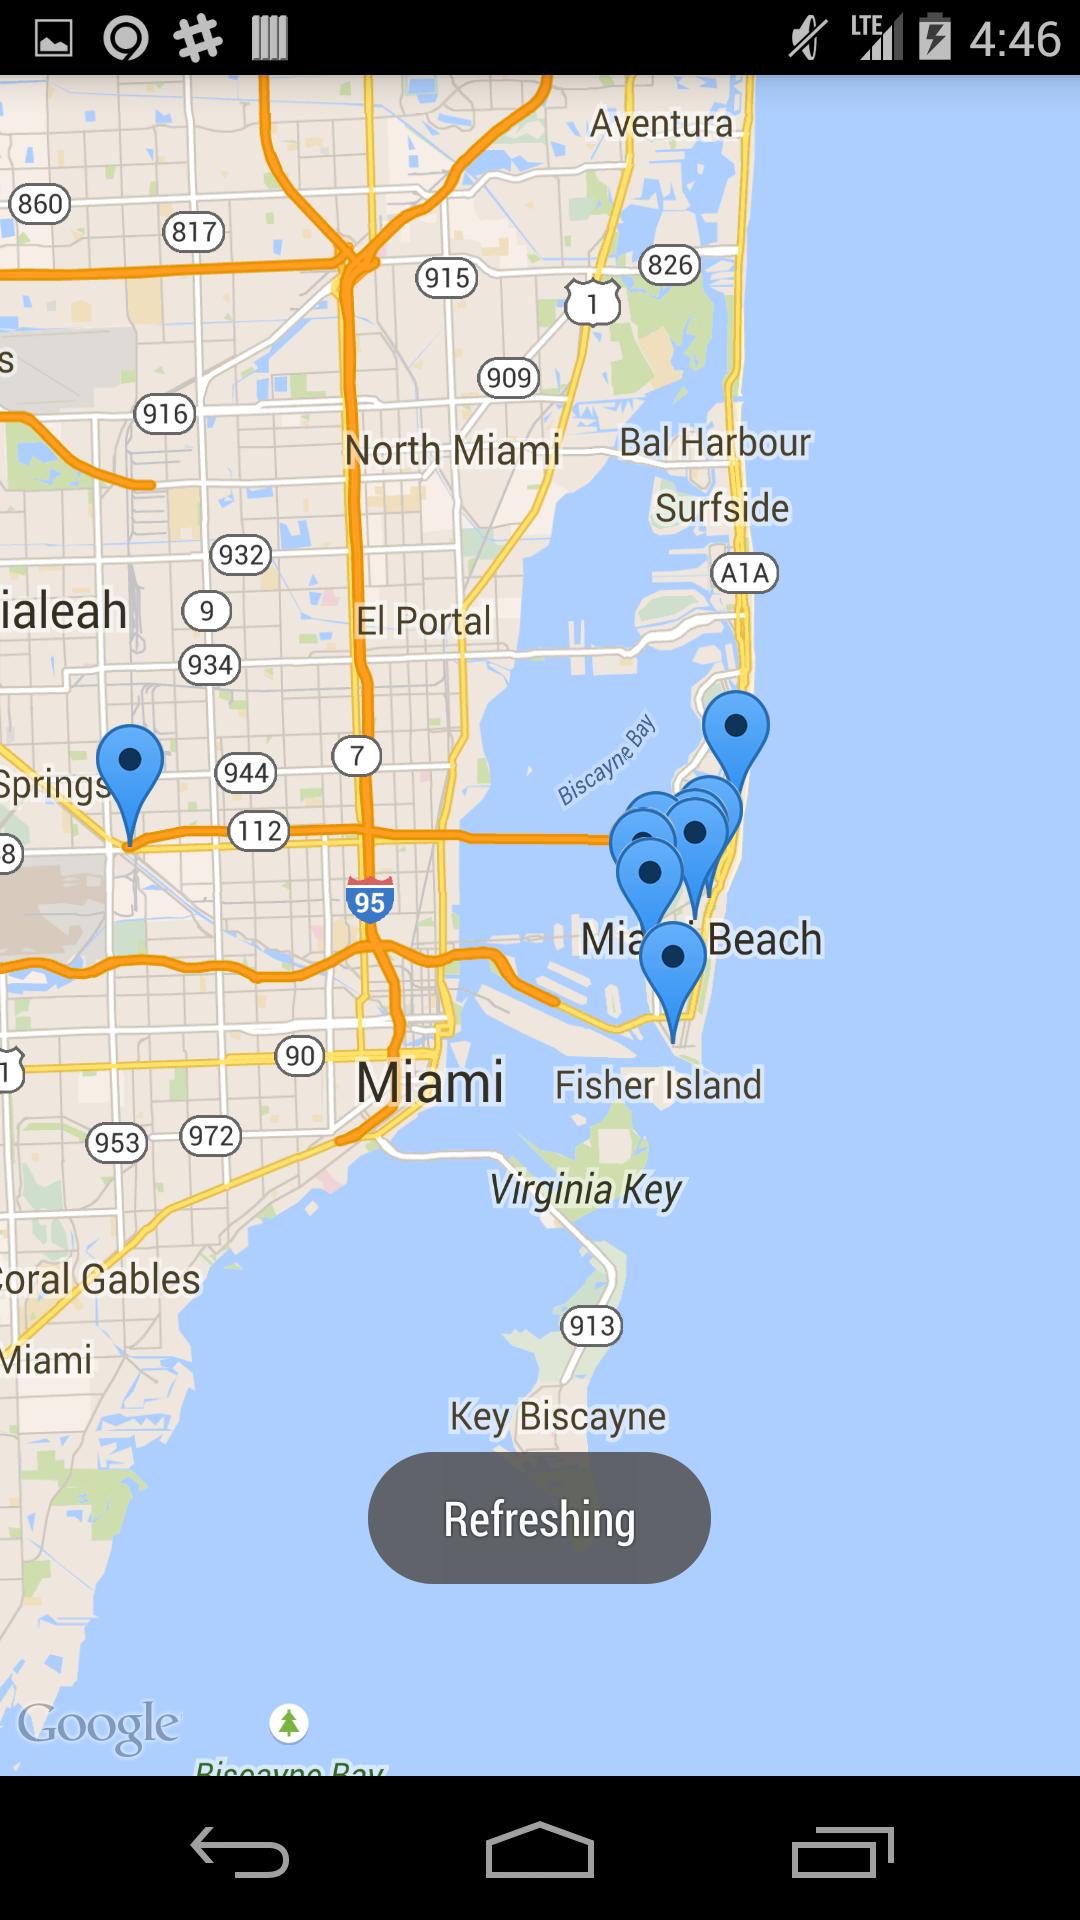 github - qtrandev/androidtransit: show miami-dade transit